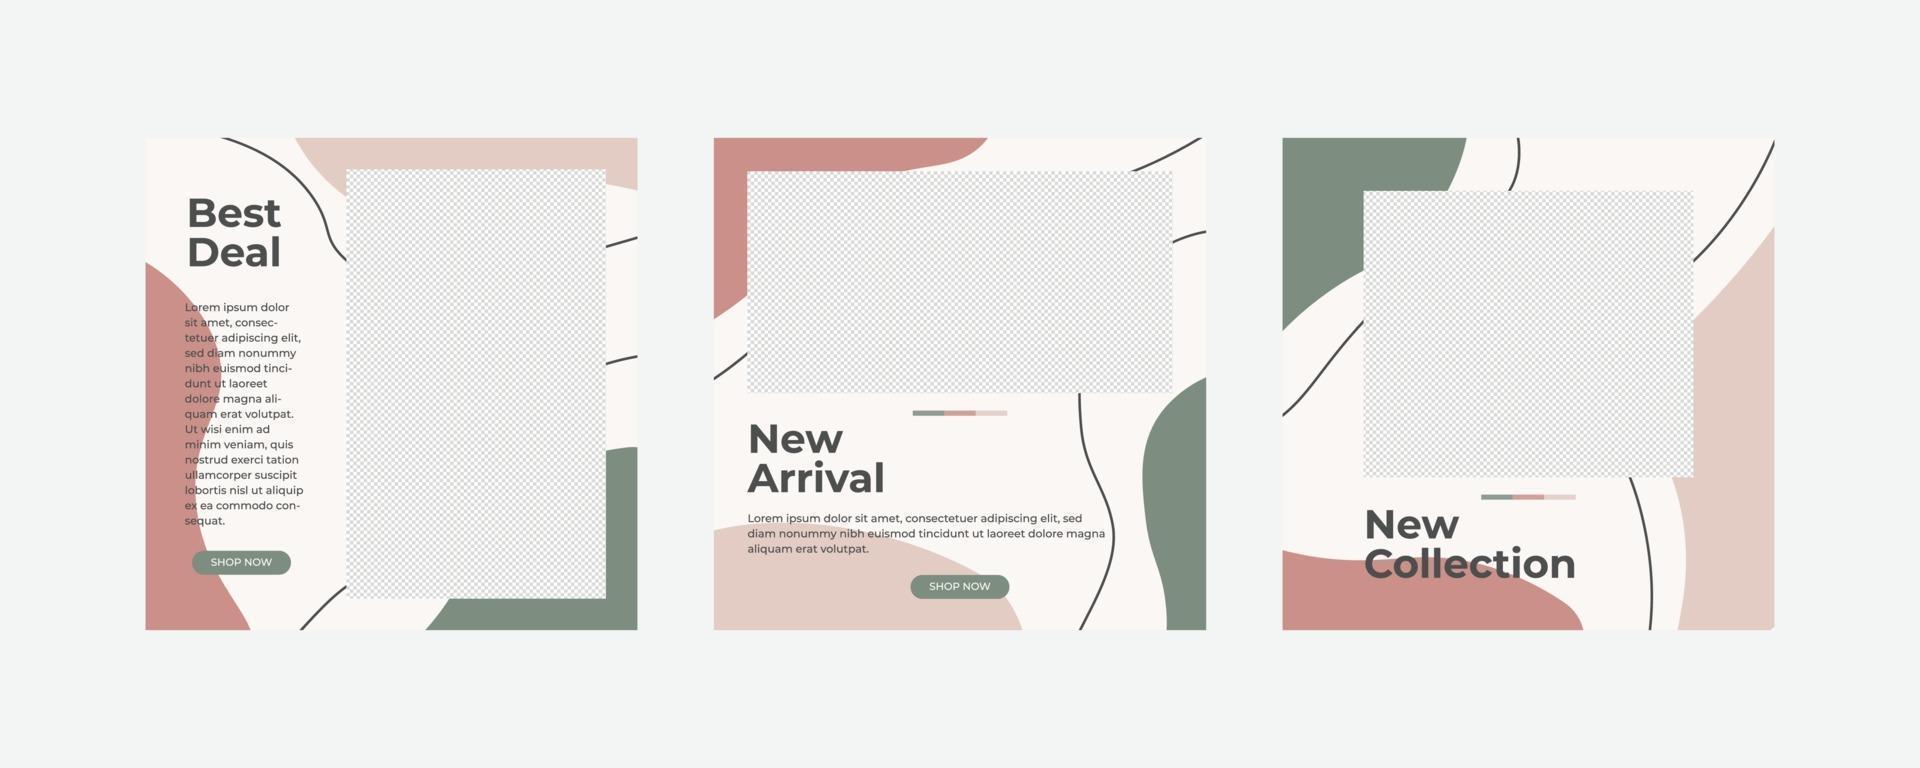 post sui social media mobili moderni minimalisti vettore